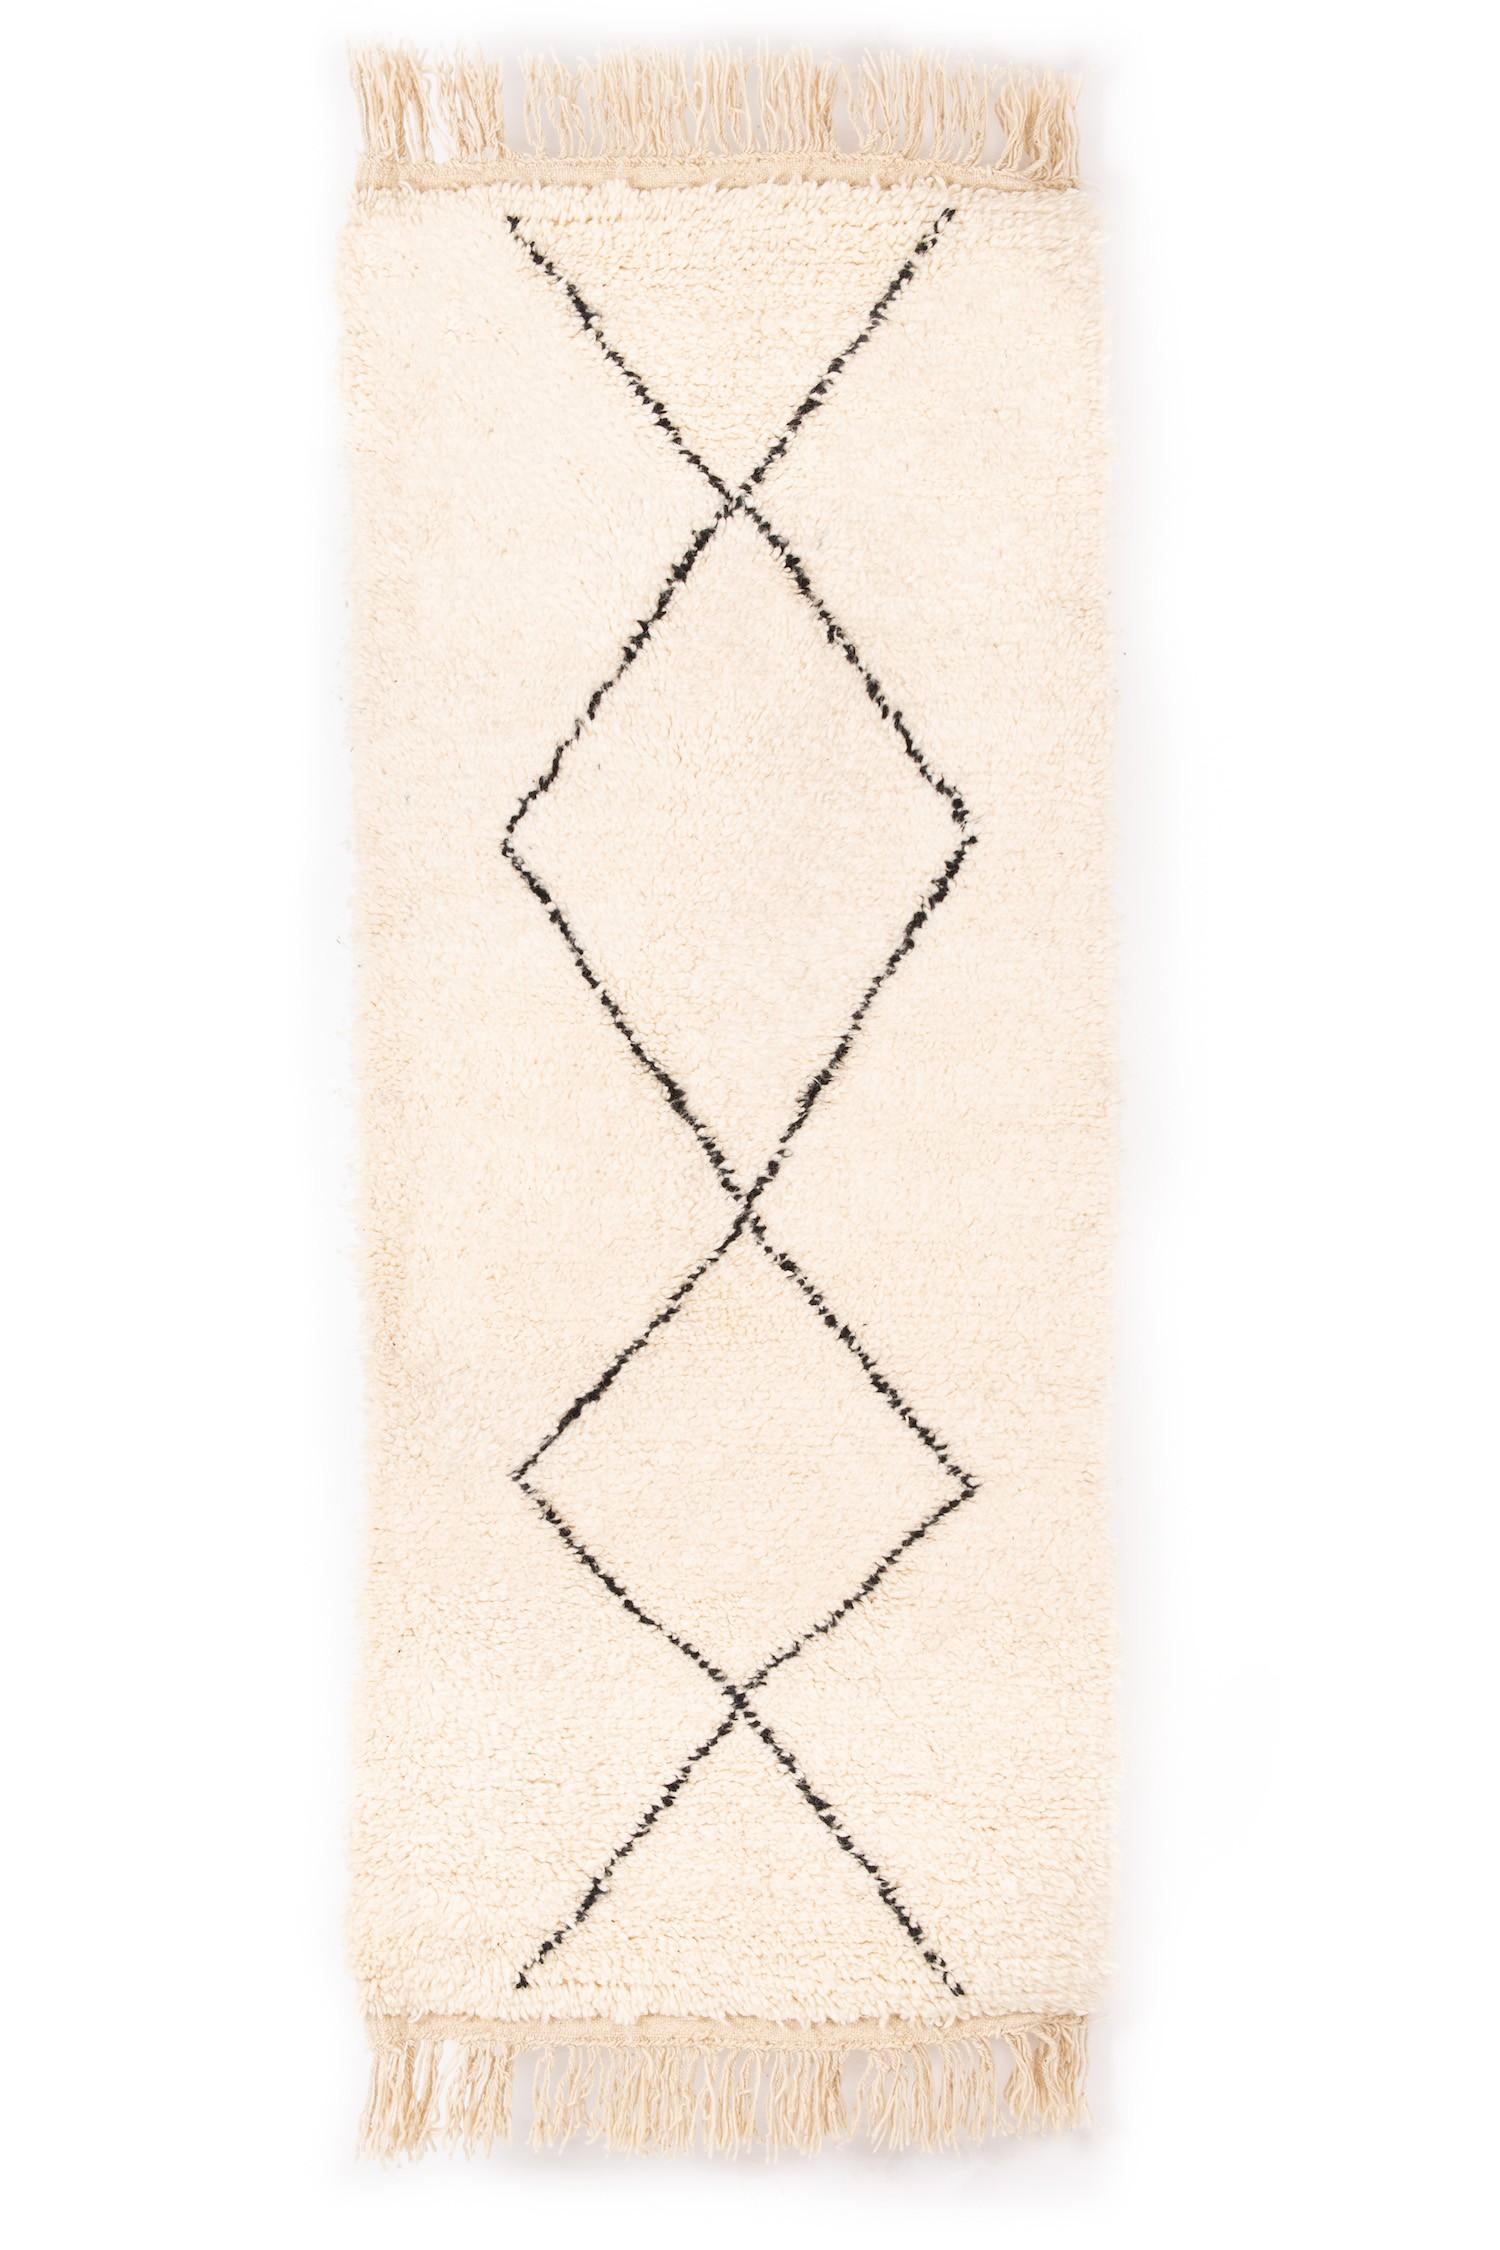 BENI OUARAIN RUG 202 x 82 cm